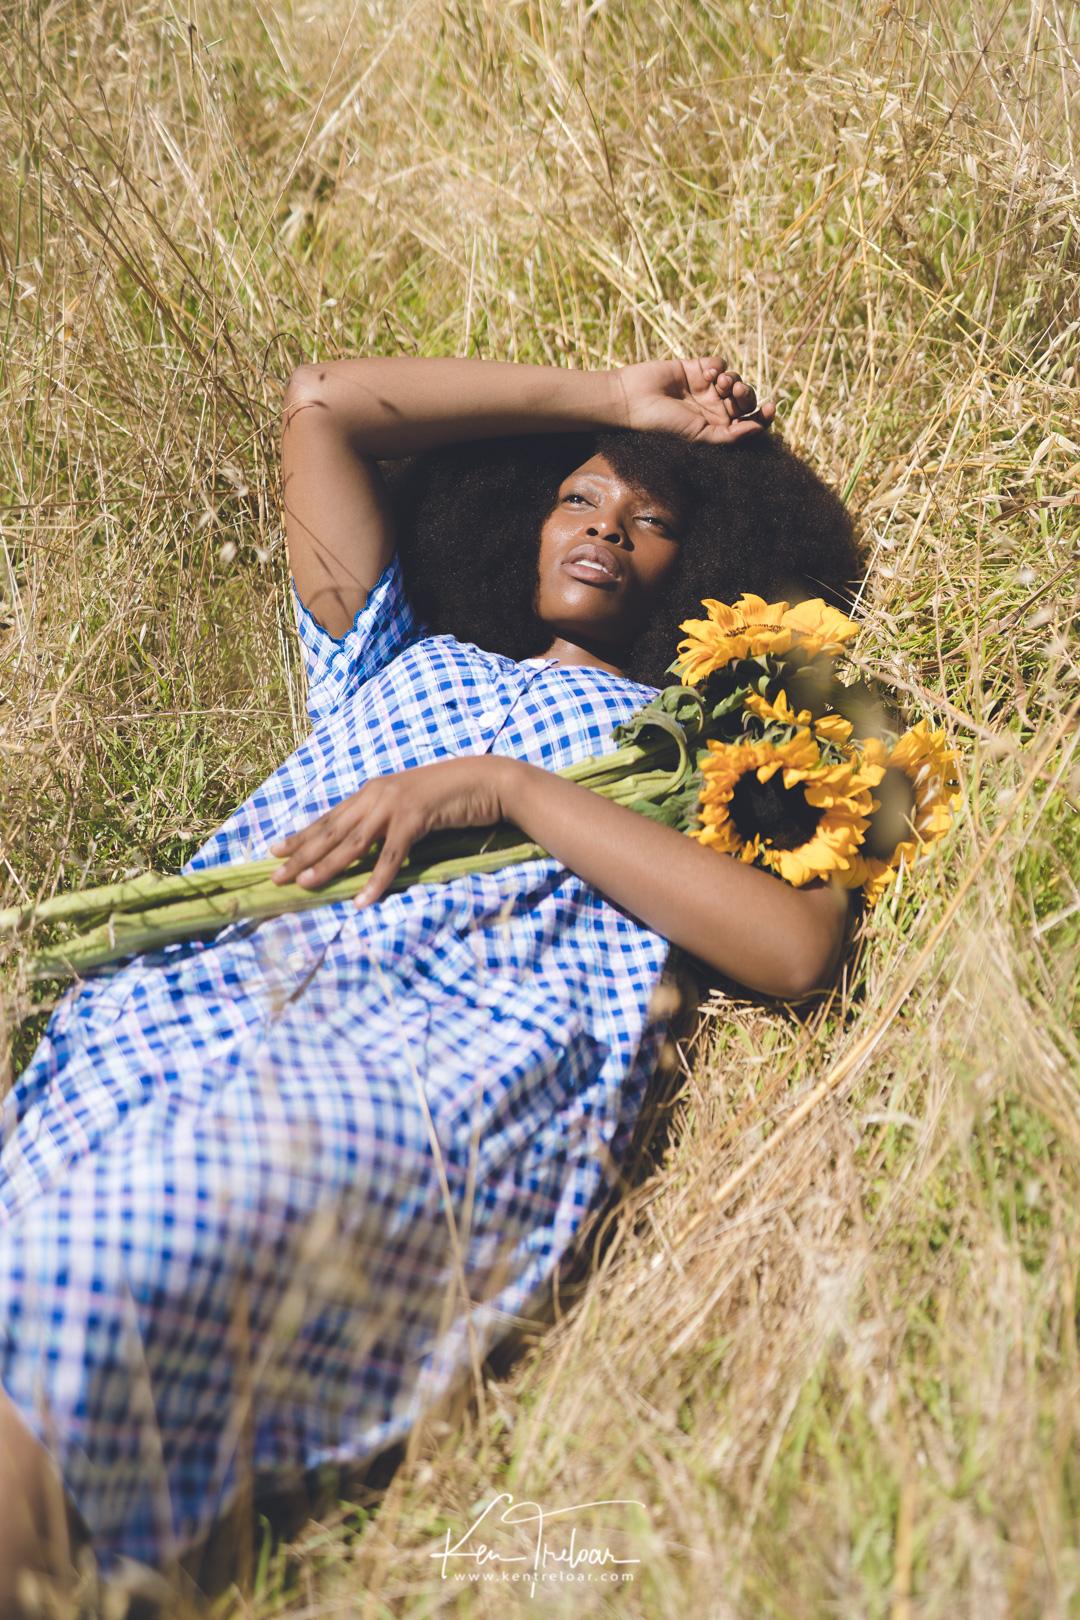 Ken Treloar Photography - Natural L-ight Editorial Portrait Fashion Photo Session - Cape Town Dec 2018-13.jpg